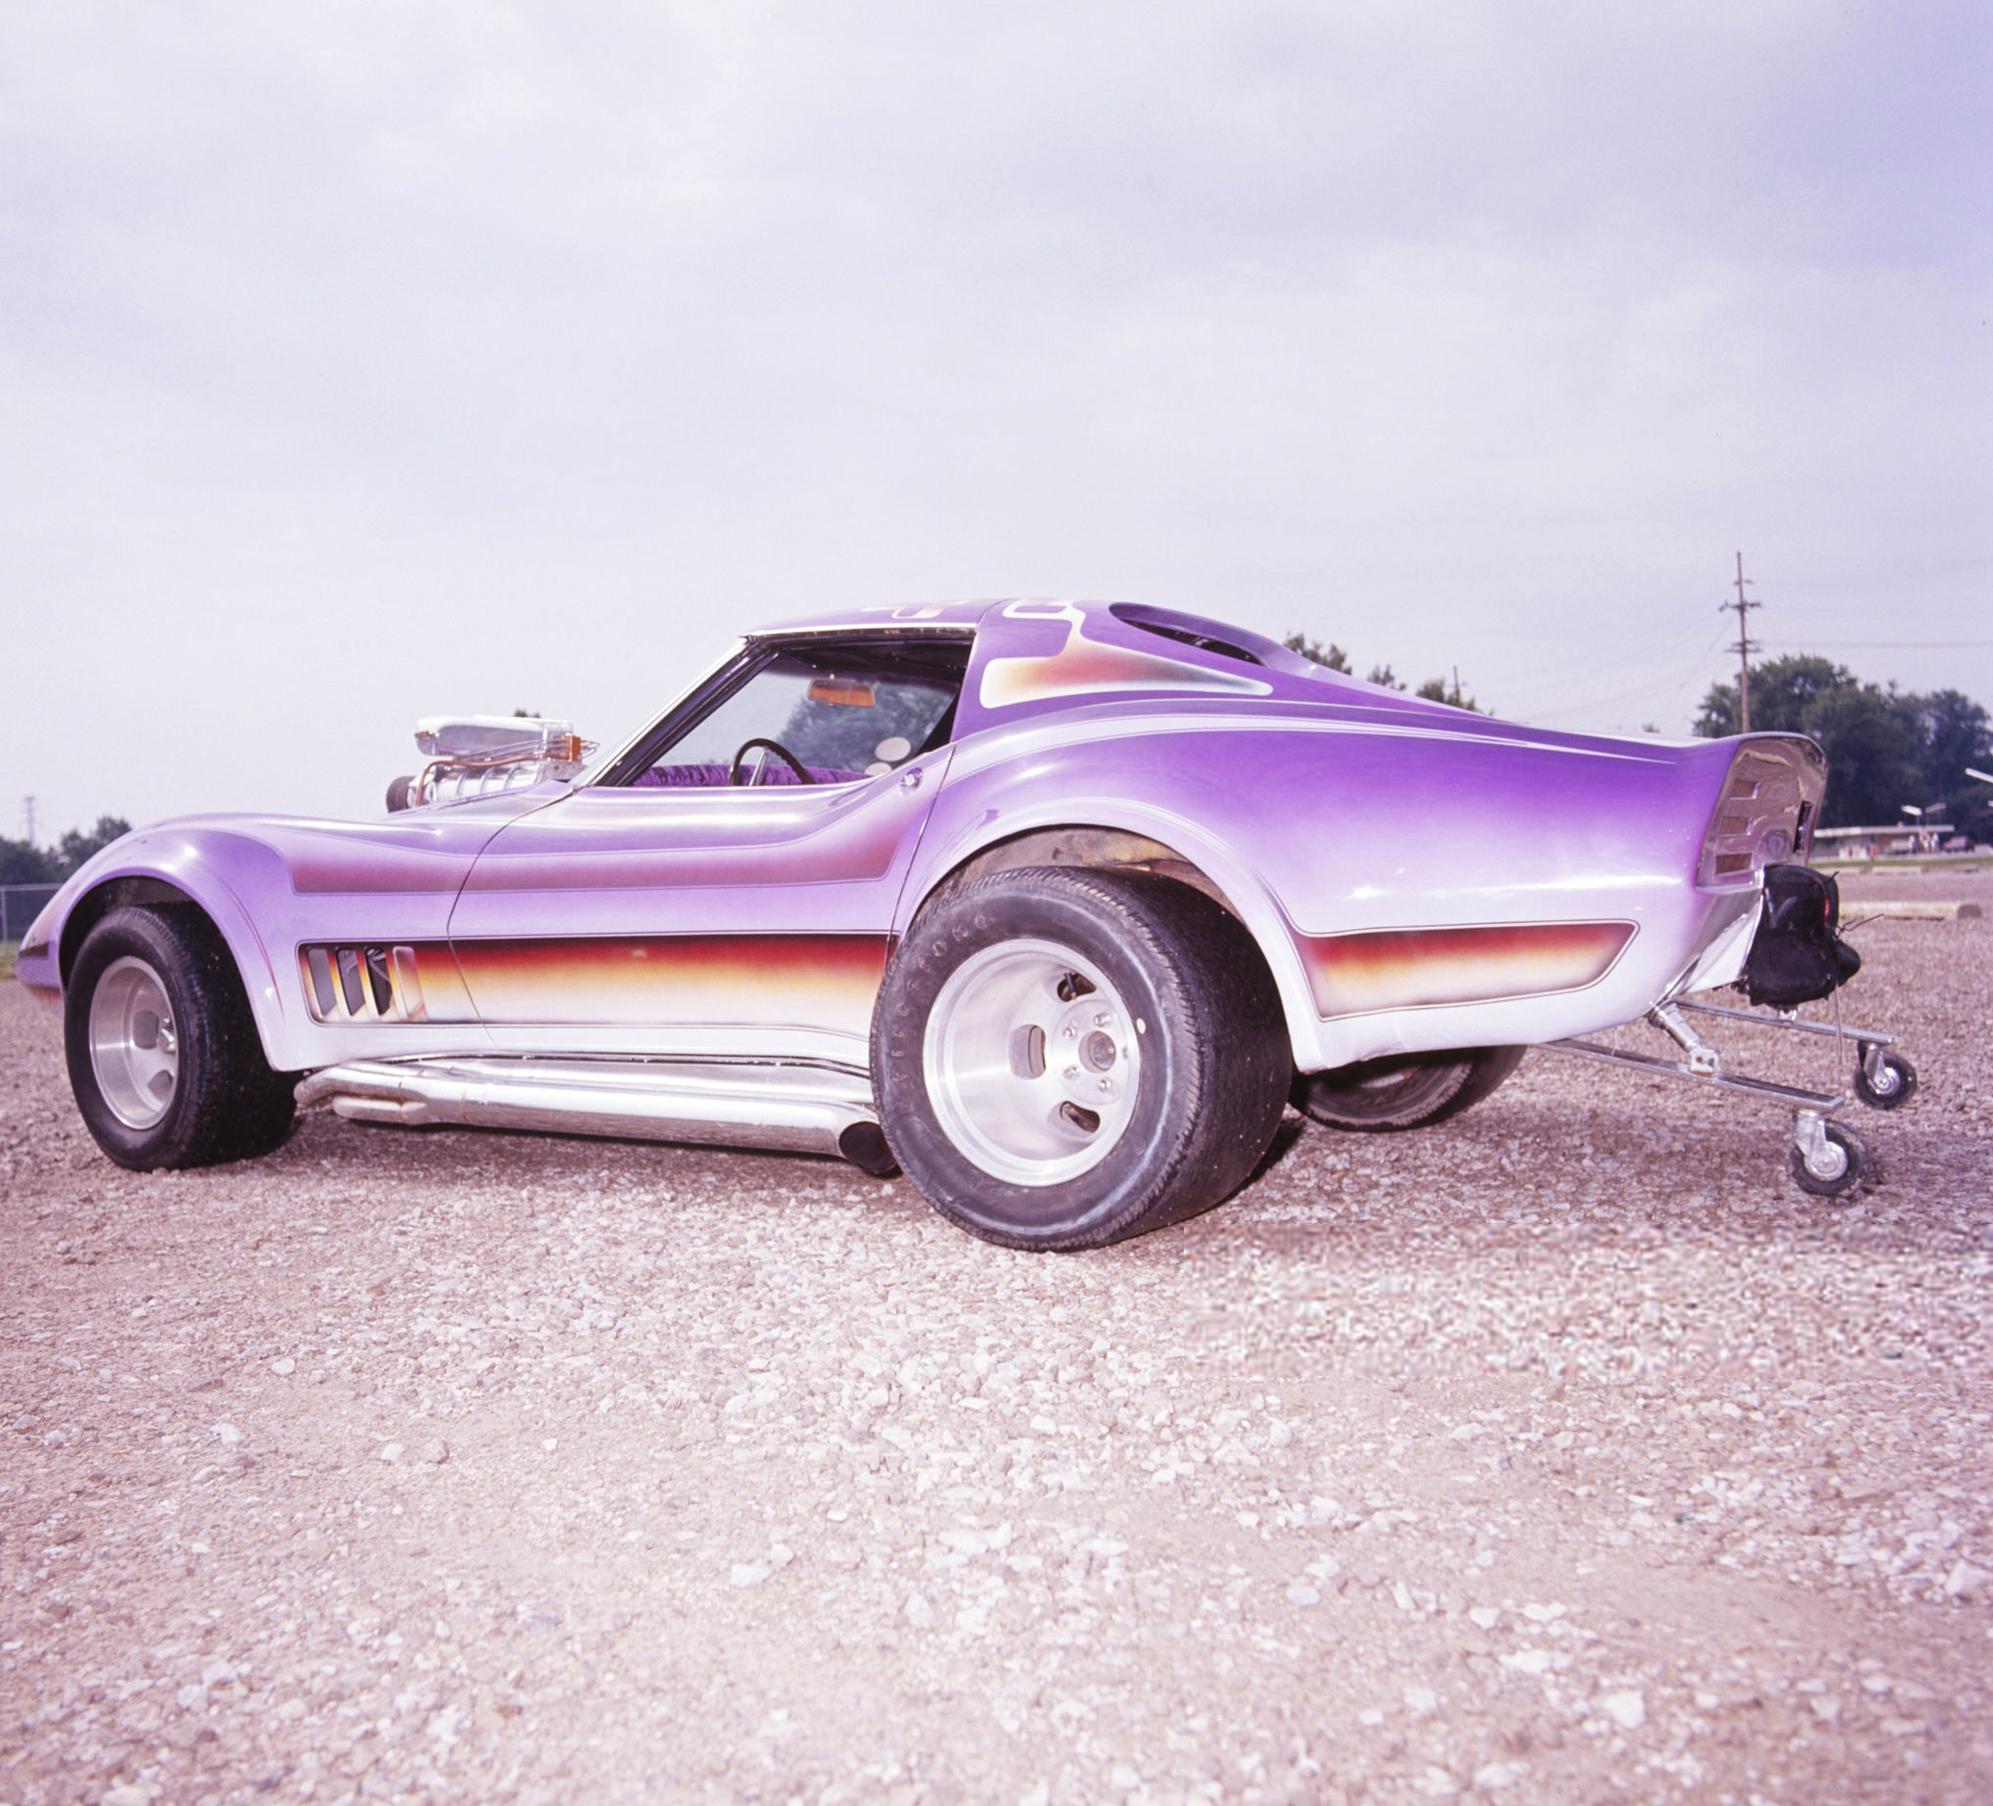 Rick Todd's Corvette, photo 4.